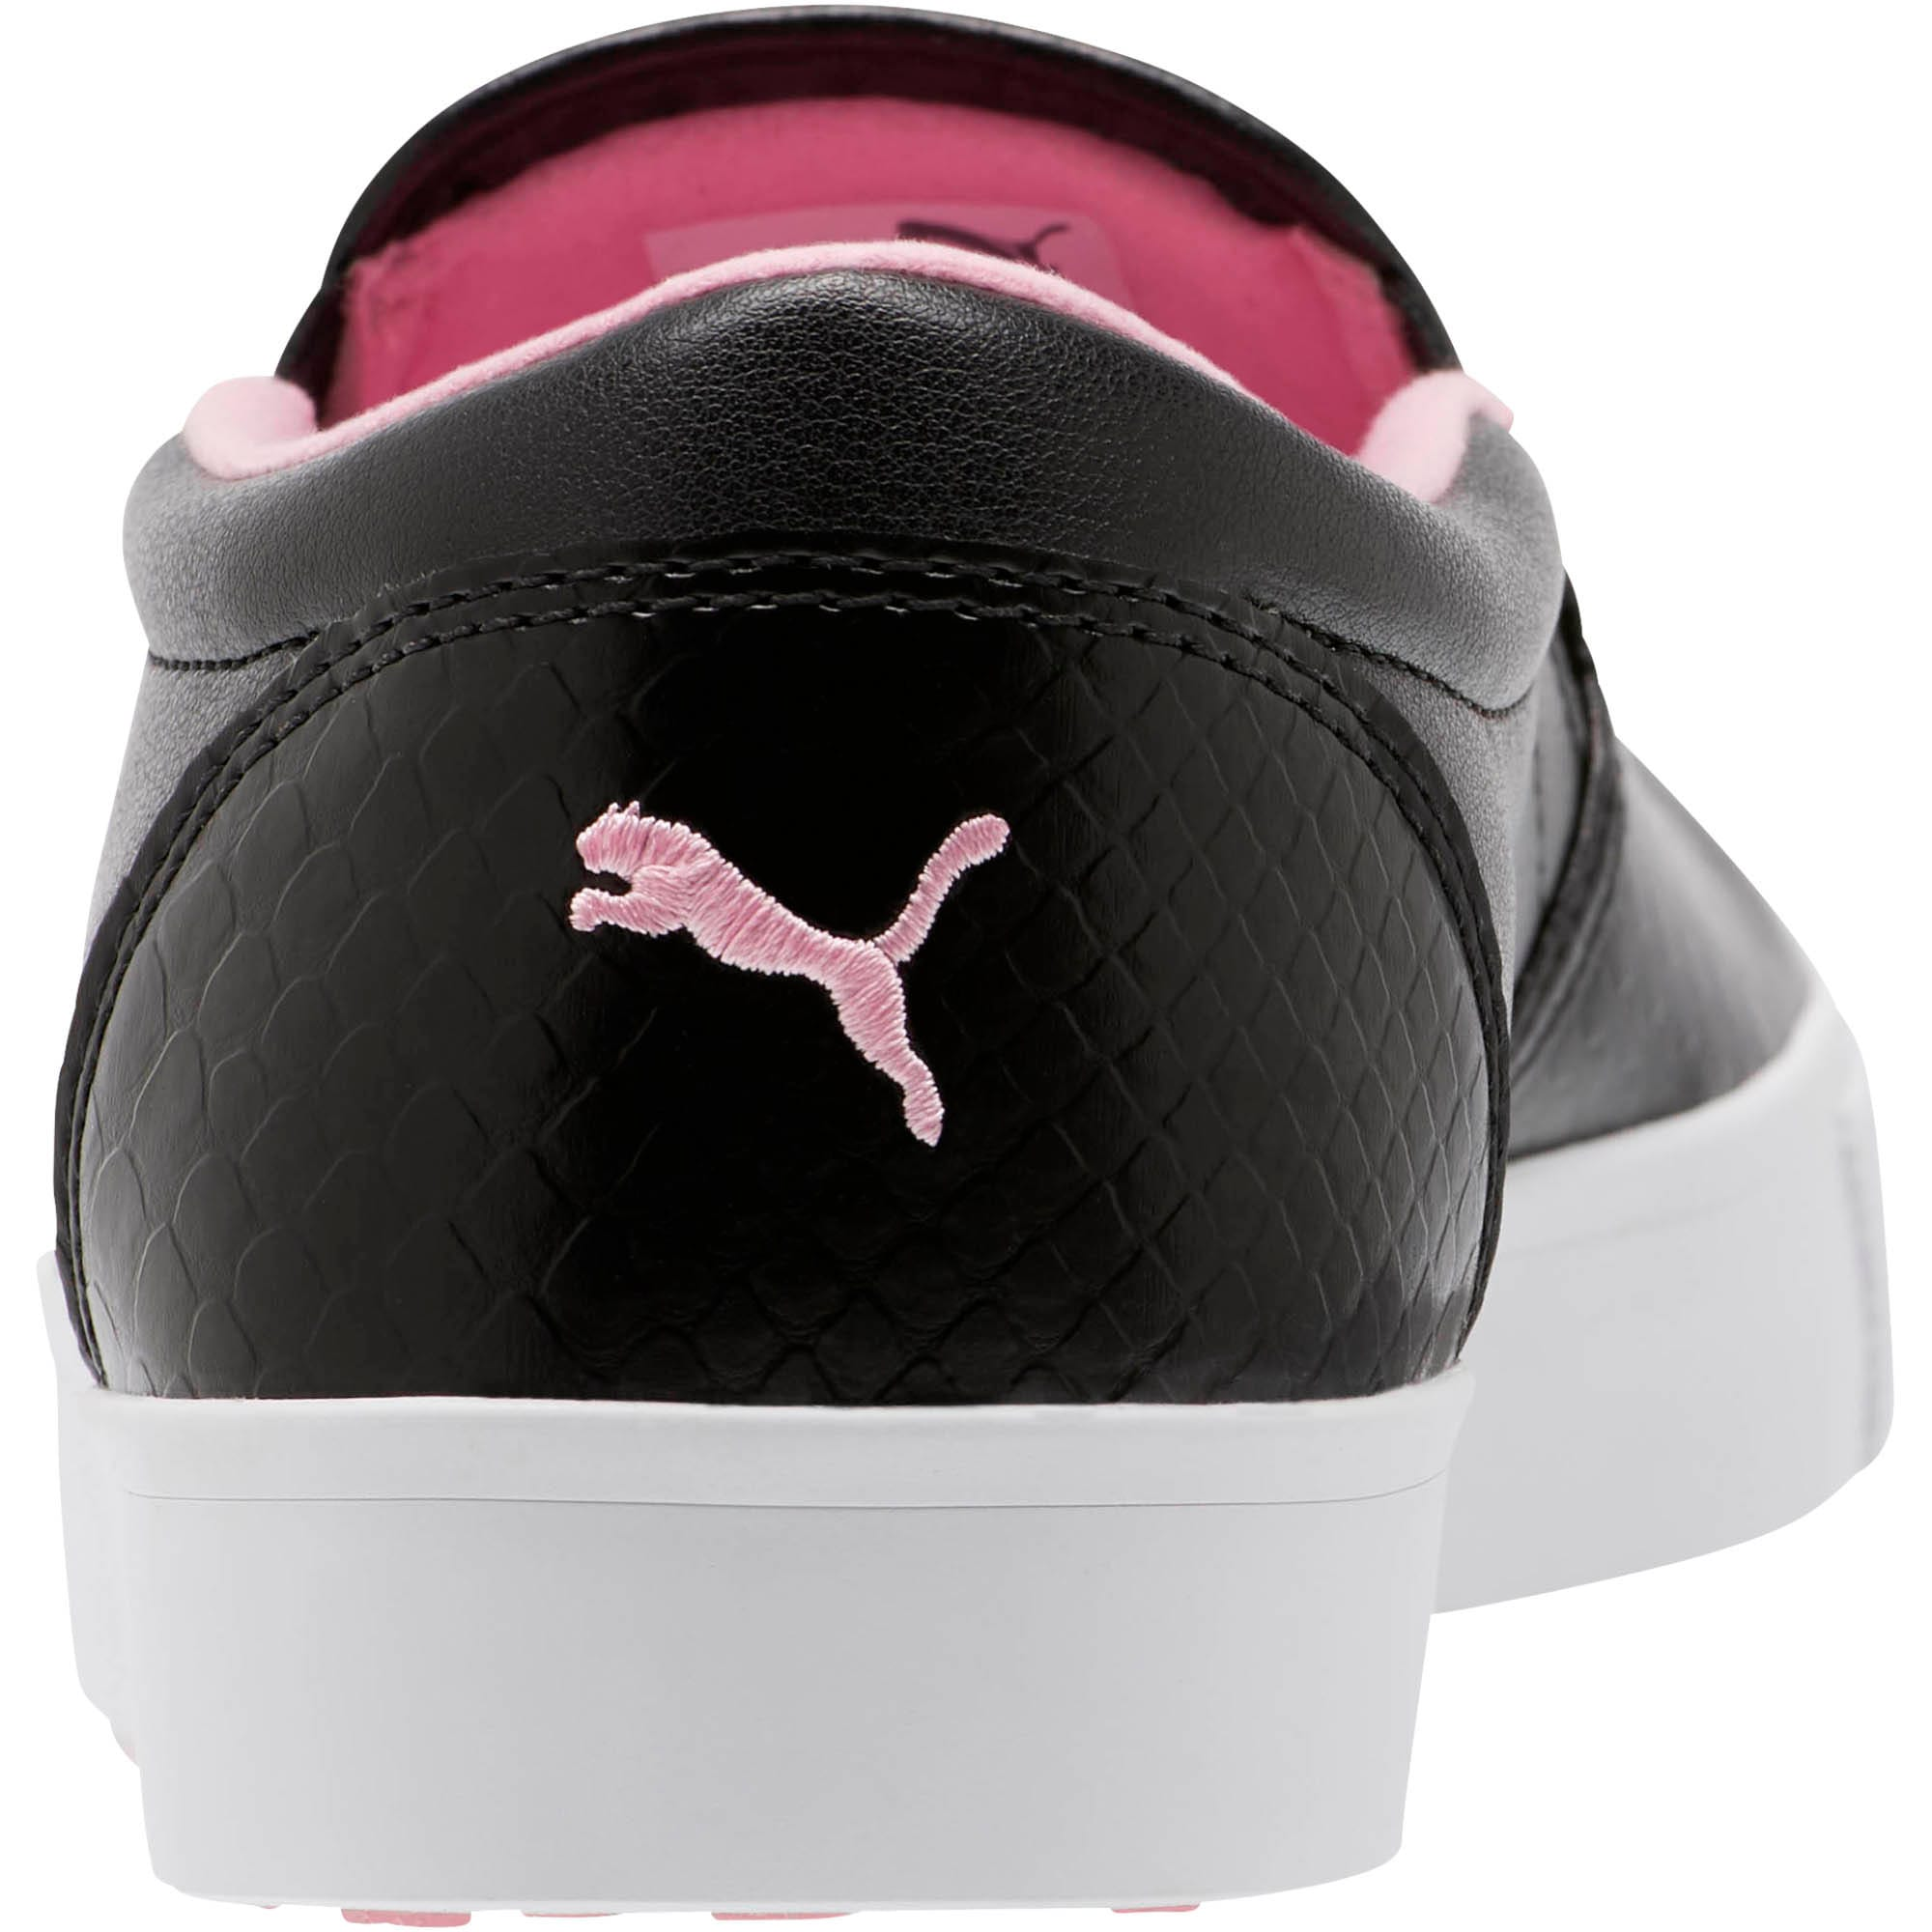 Thumbnail 3 of Tustin Women's Slip-On Golf Shoes, Black-PRISM PINK, medium